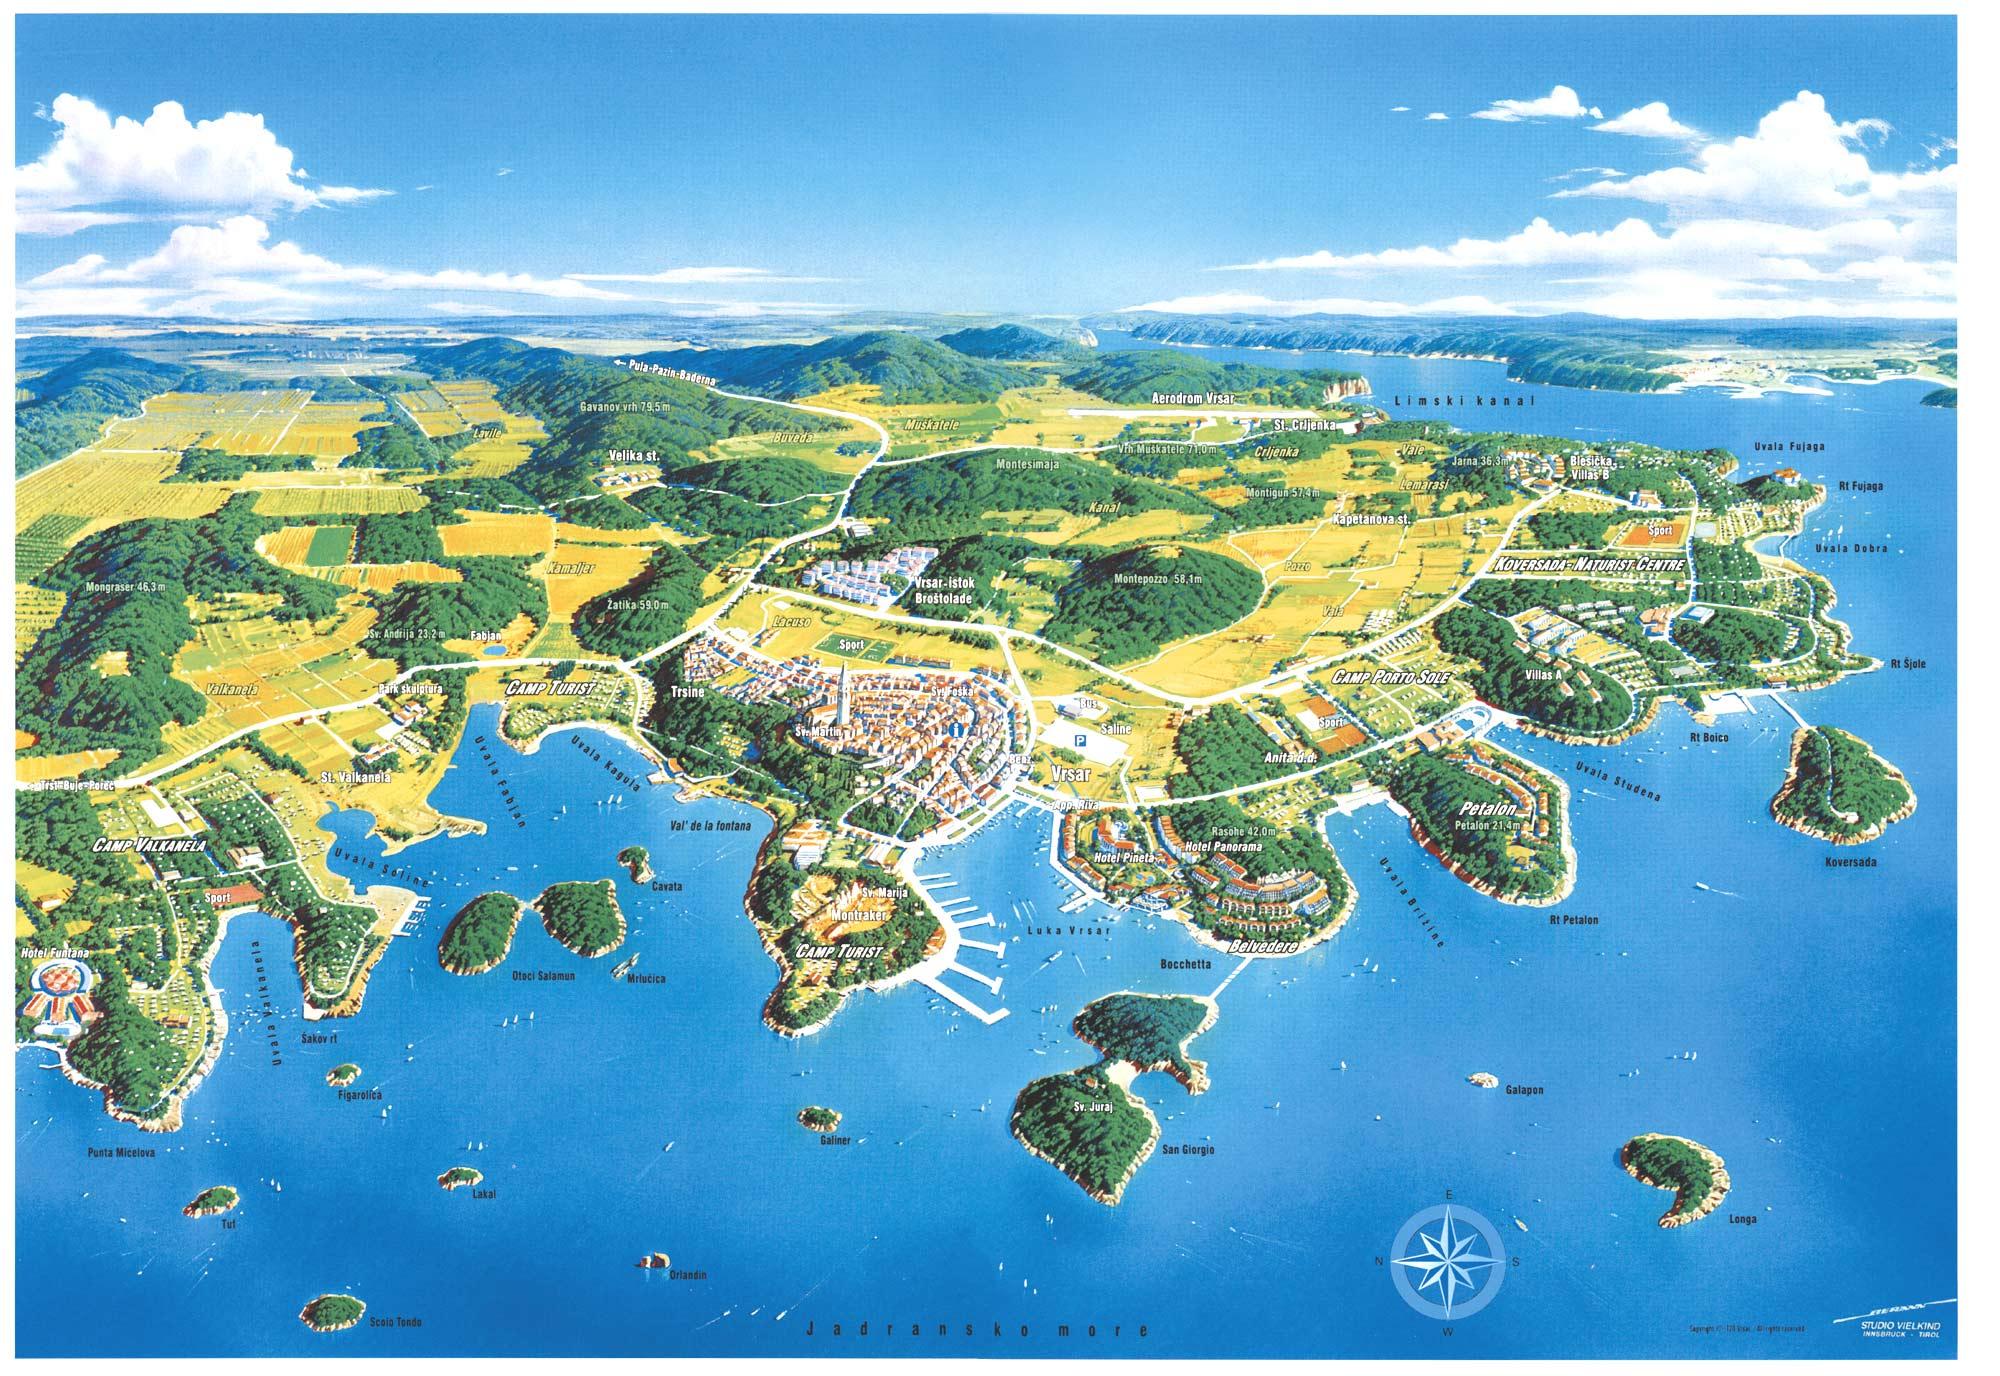 Chorvatsko Mapa Mapy Pro Cele Chorvatsko